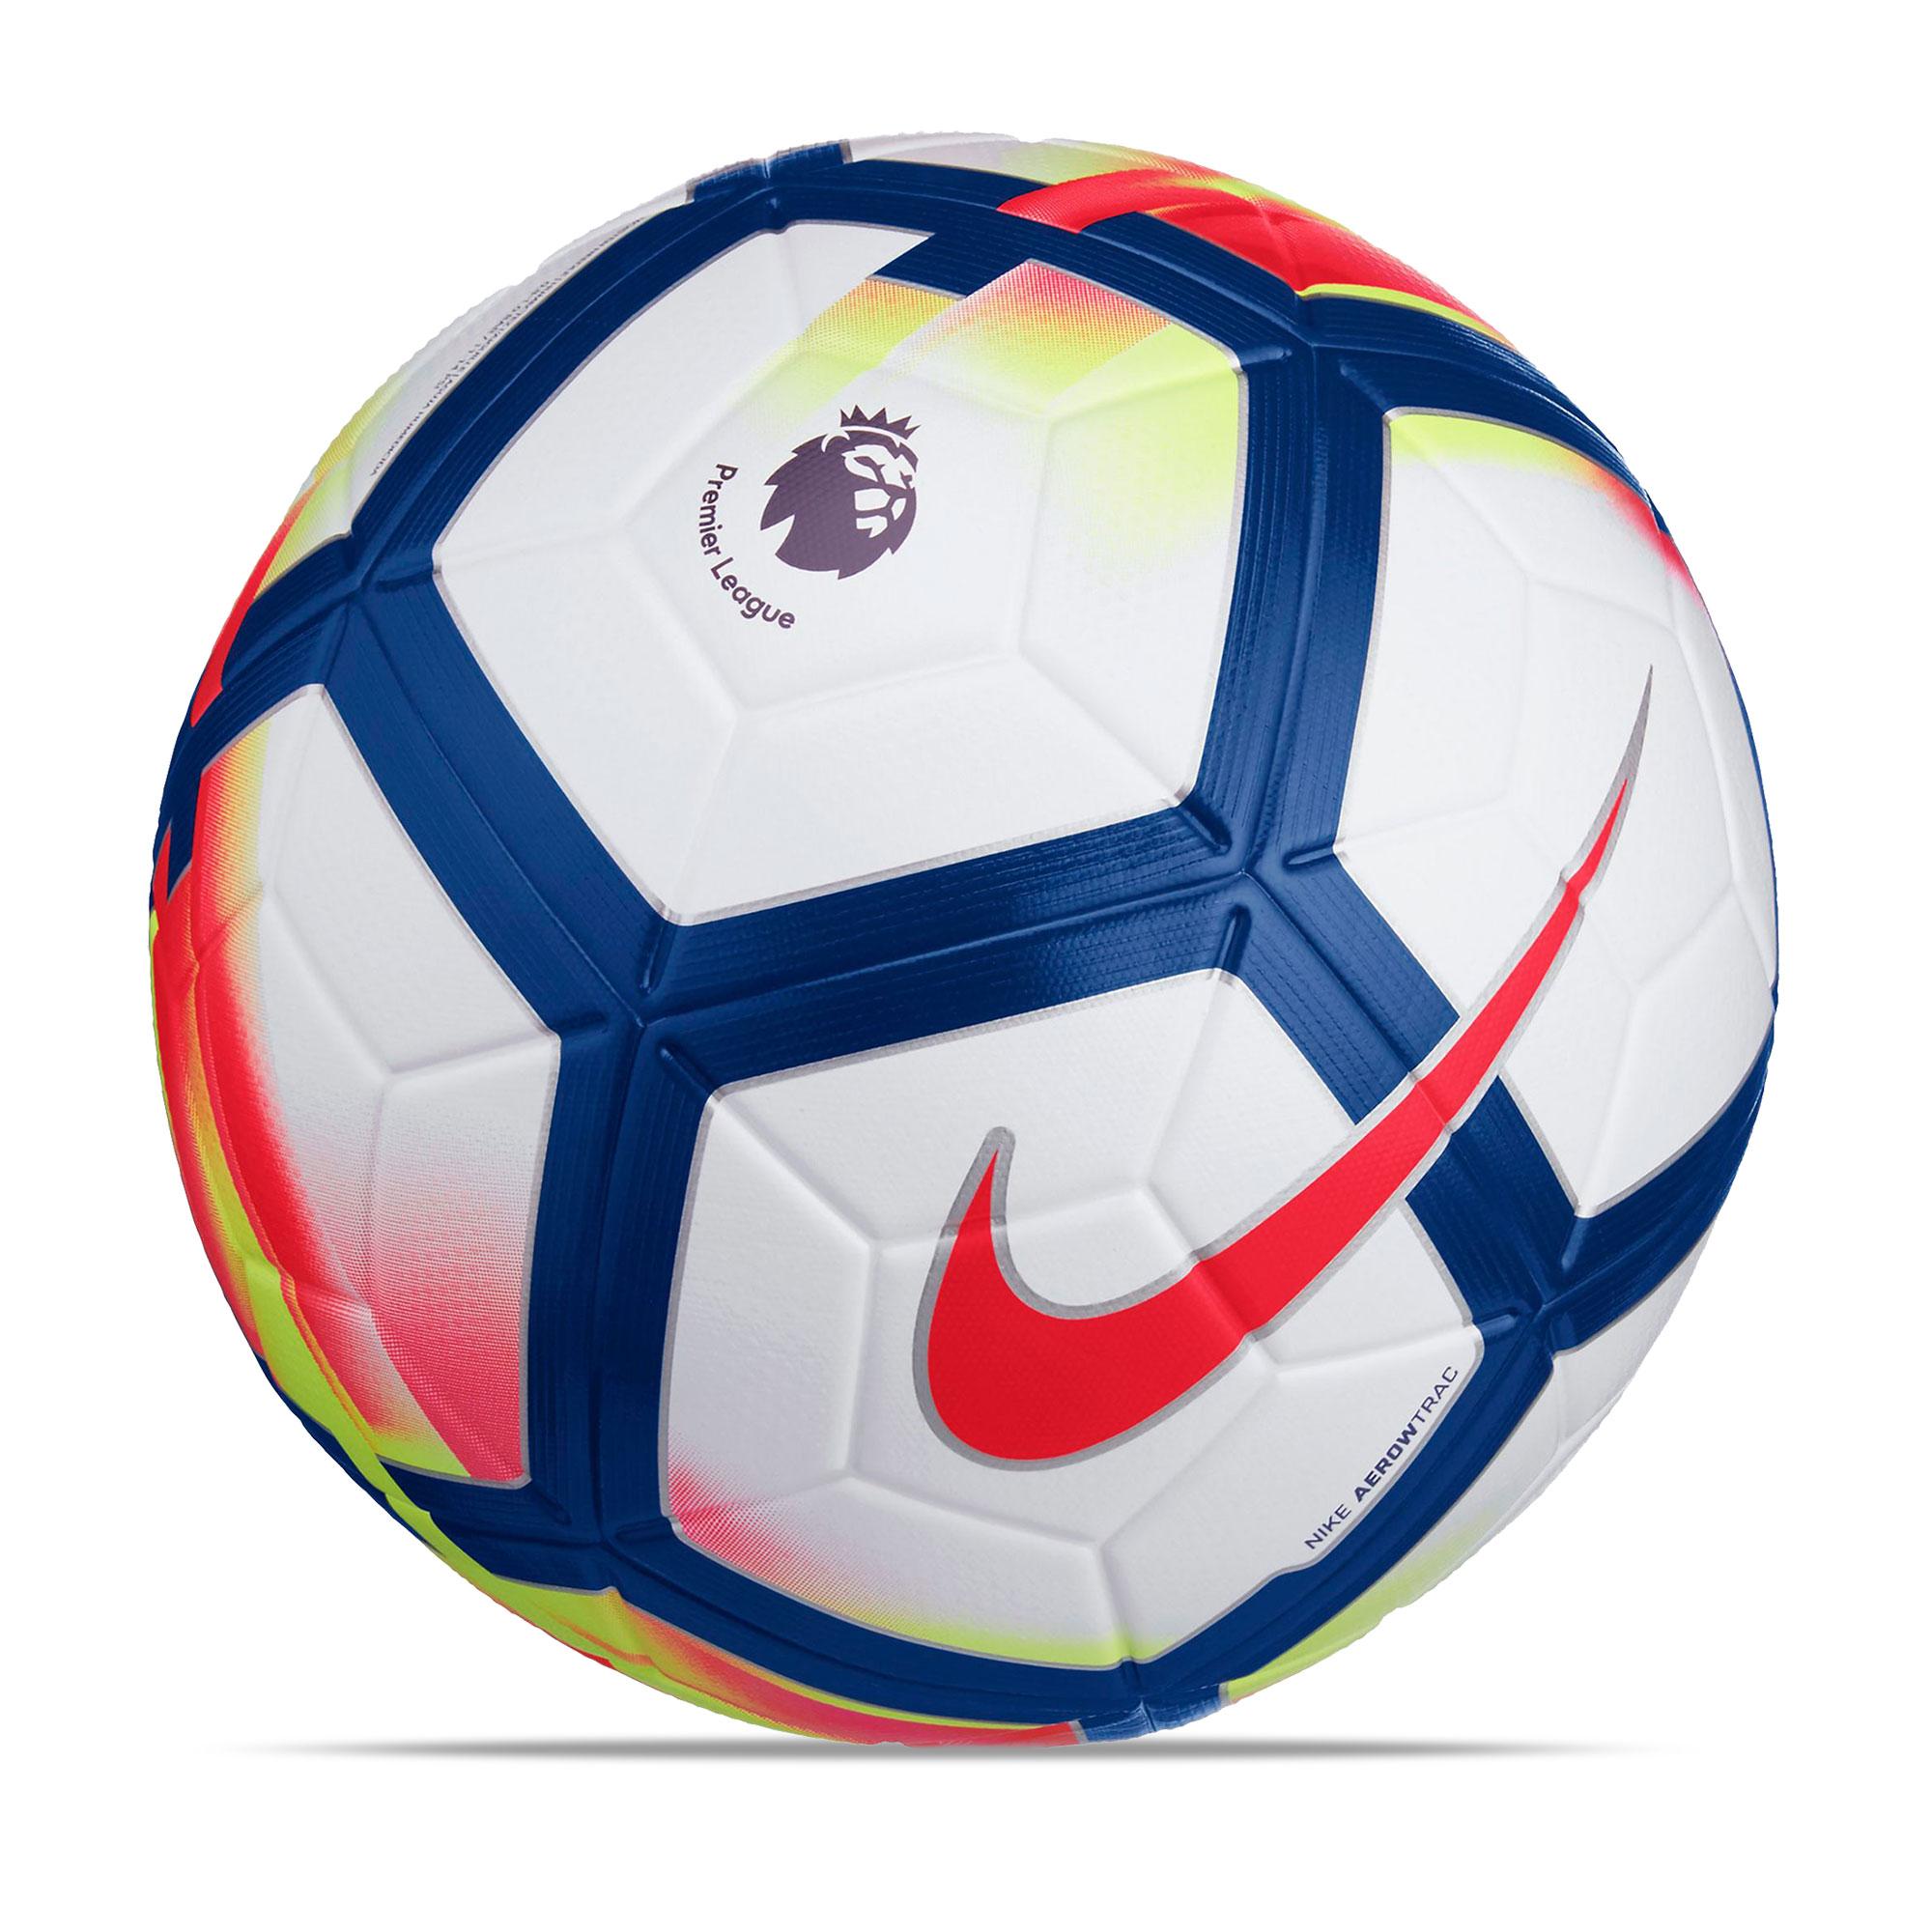 Nike Premier League Ordem V Official Match Football - White/Crimson/De